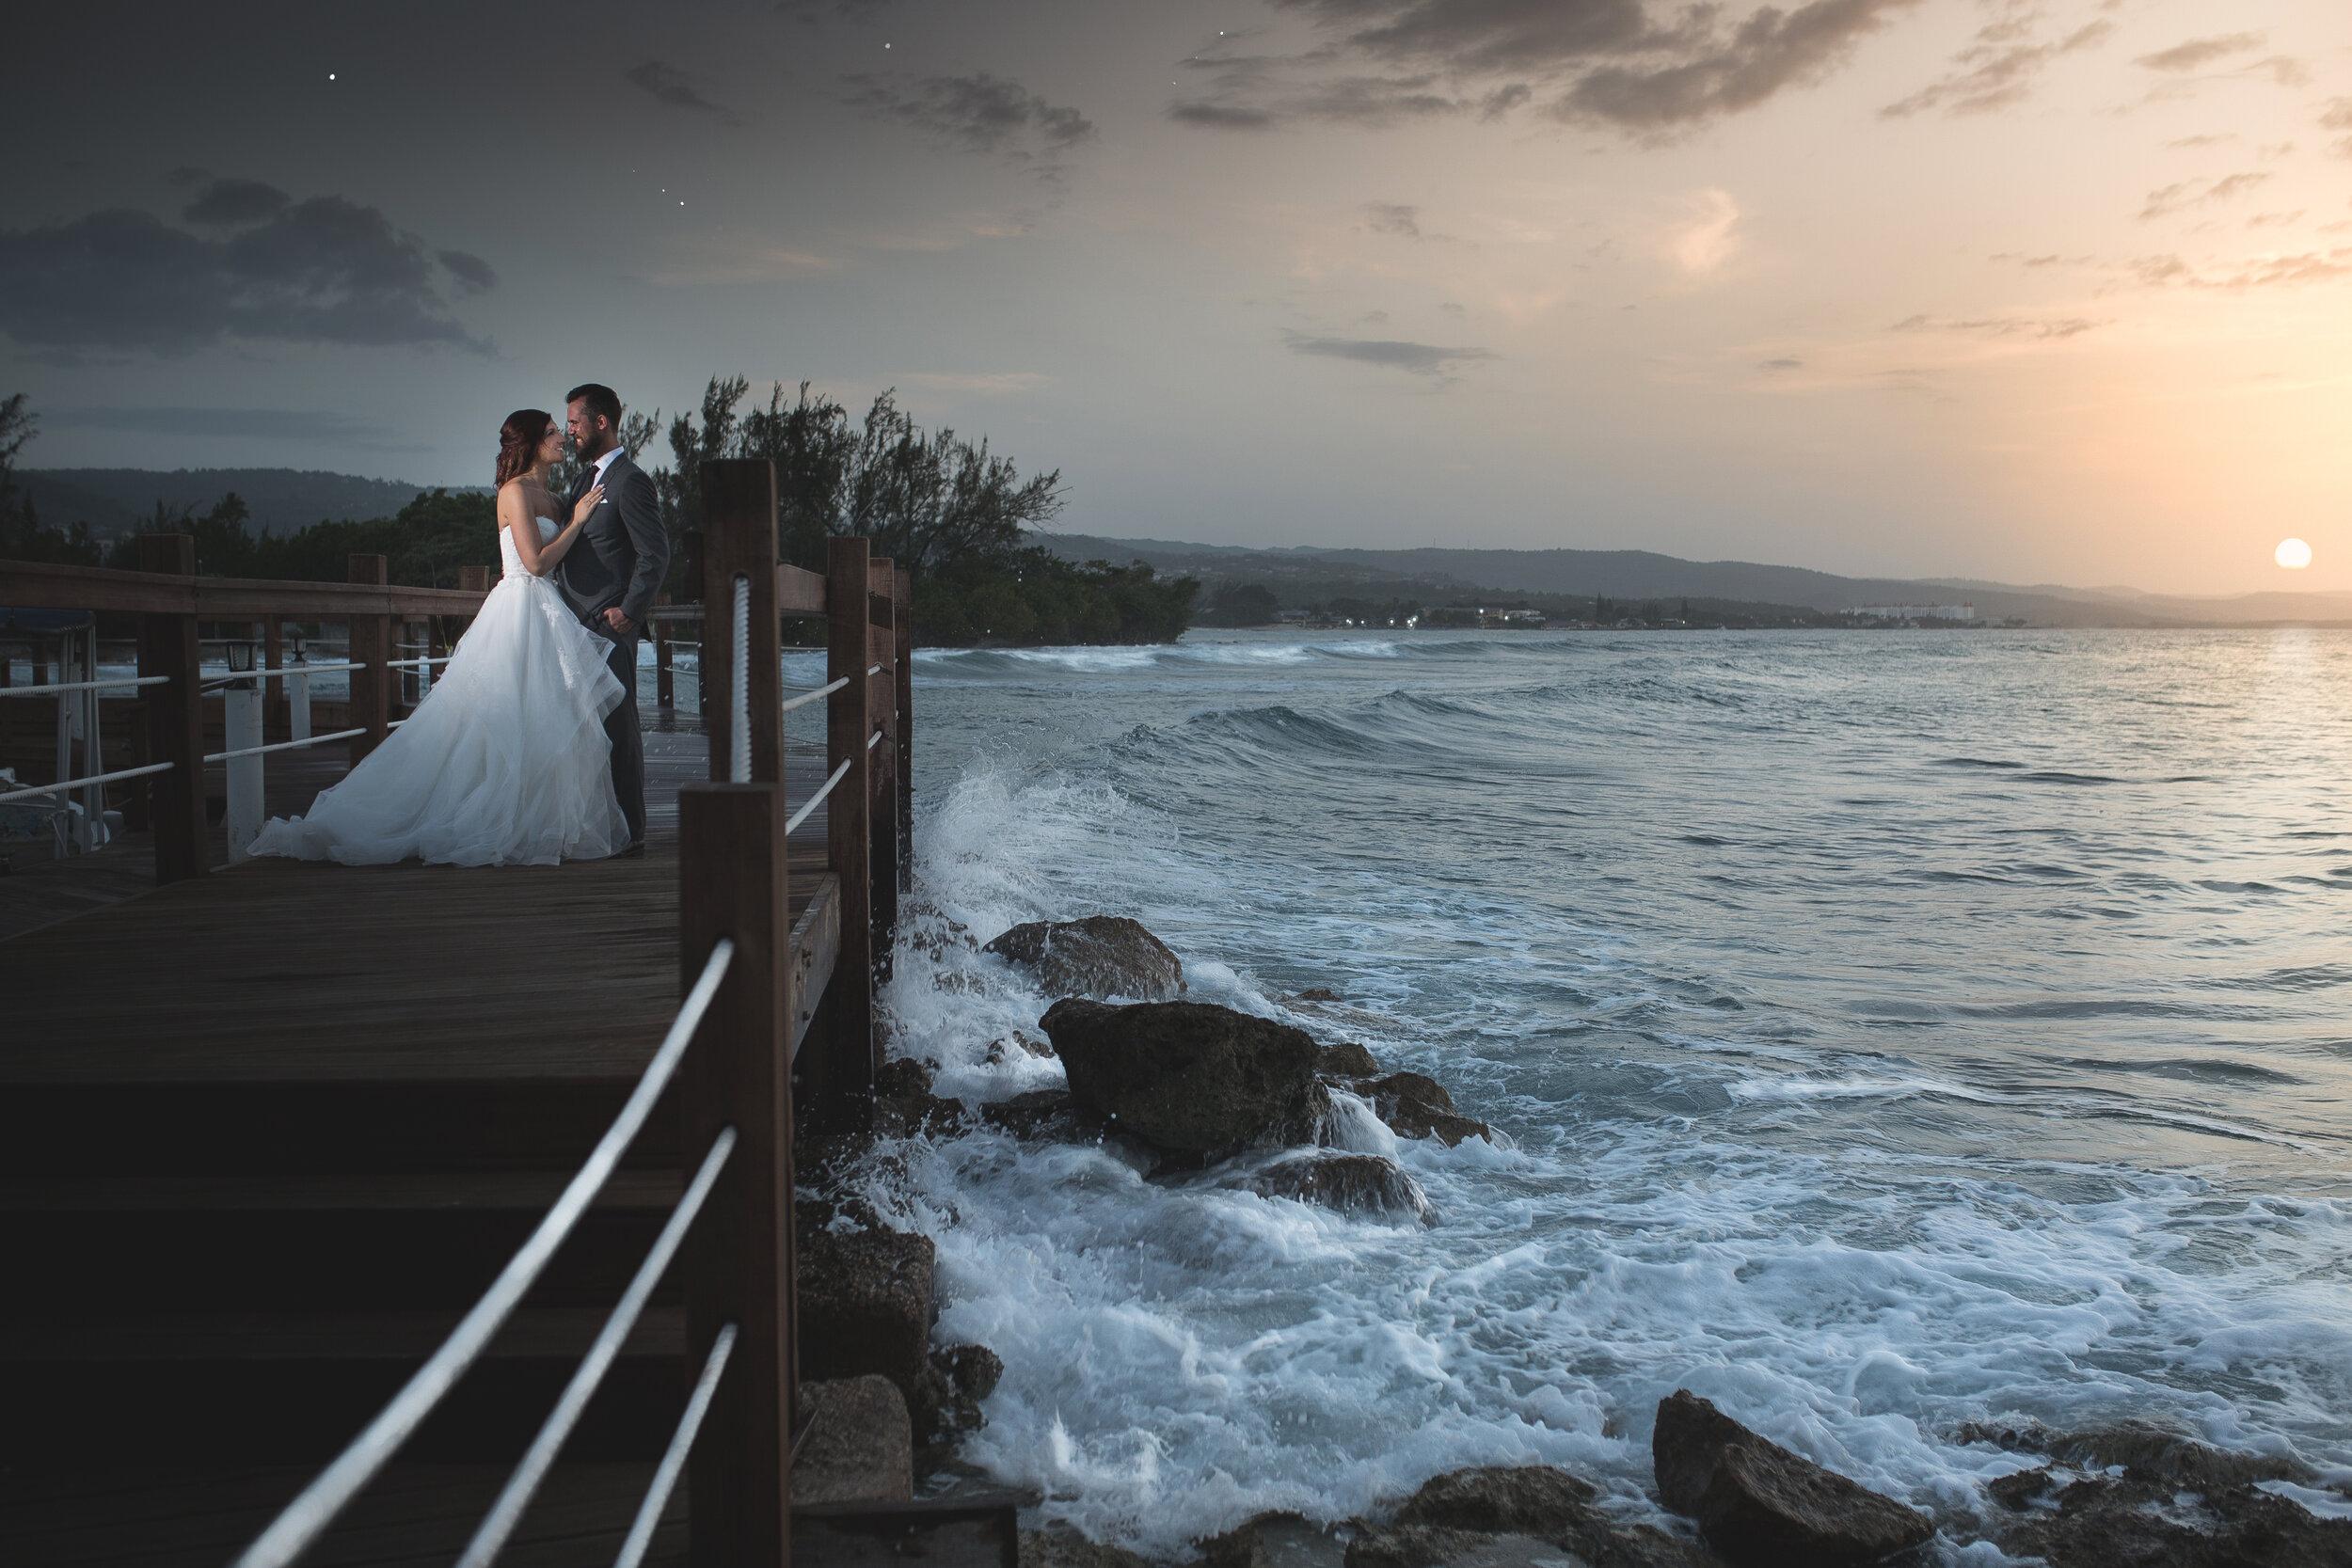 NOLOGO-Emily & Mason Jamaica Wedding Adam Ziorio Photography-2.jpg